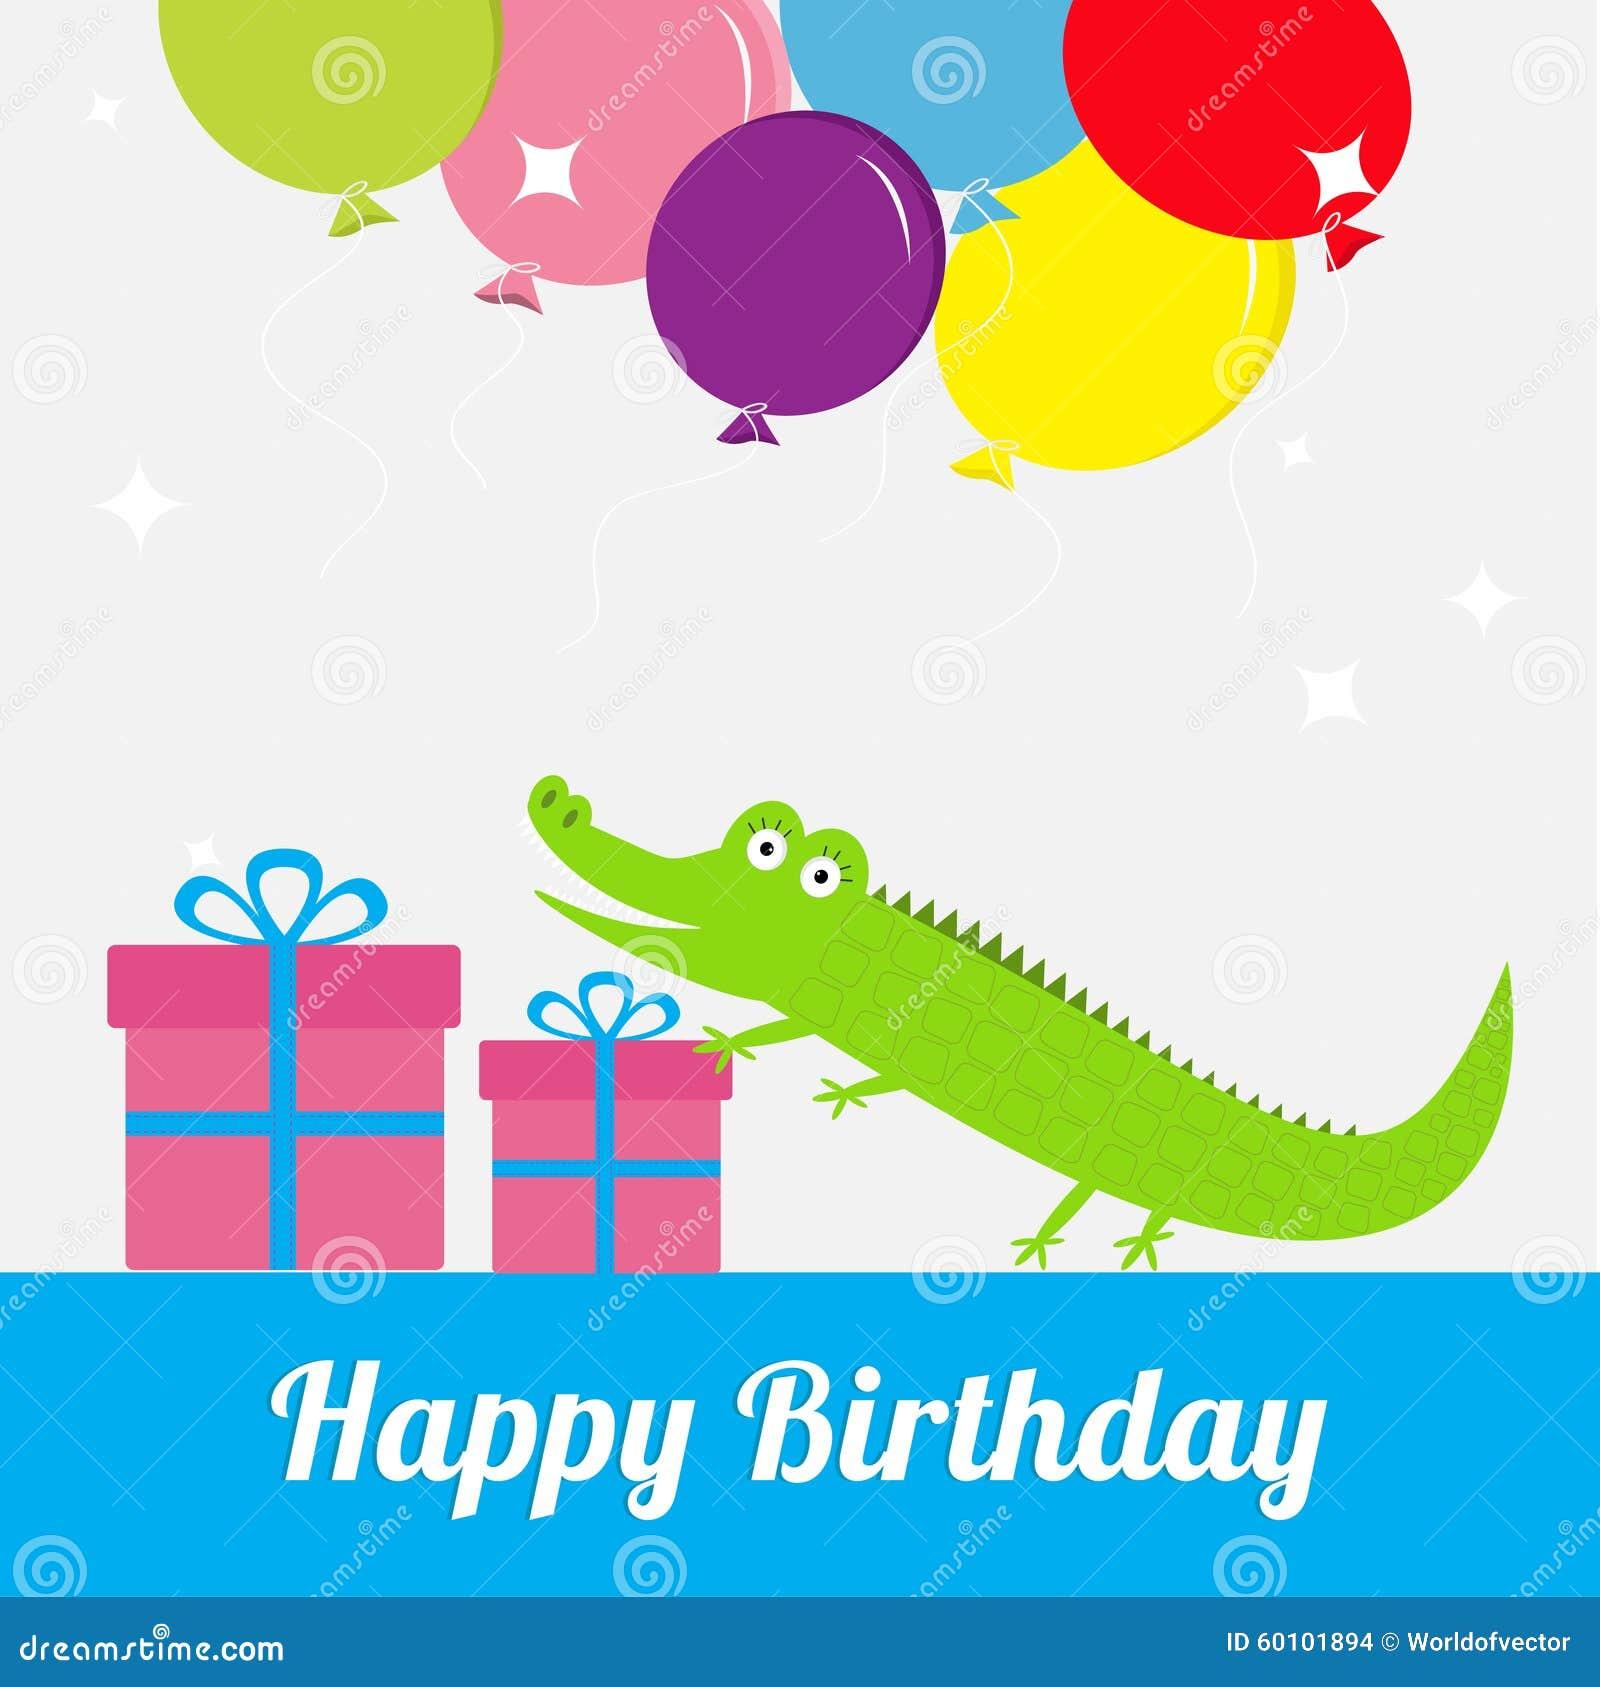 Happy birthday card with cute alligator giftbox balloons baby happy birthday card with cute alligator giftbox balloons baby background flat design bookmarktalkfo Choice Image